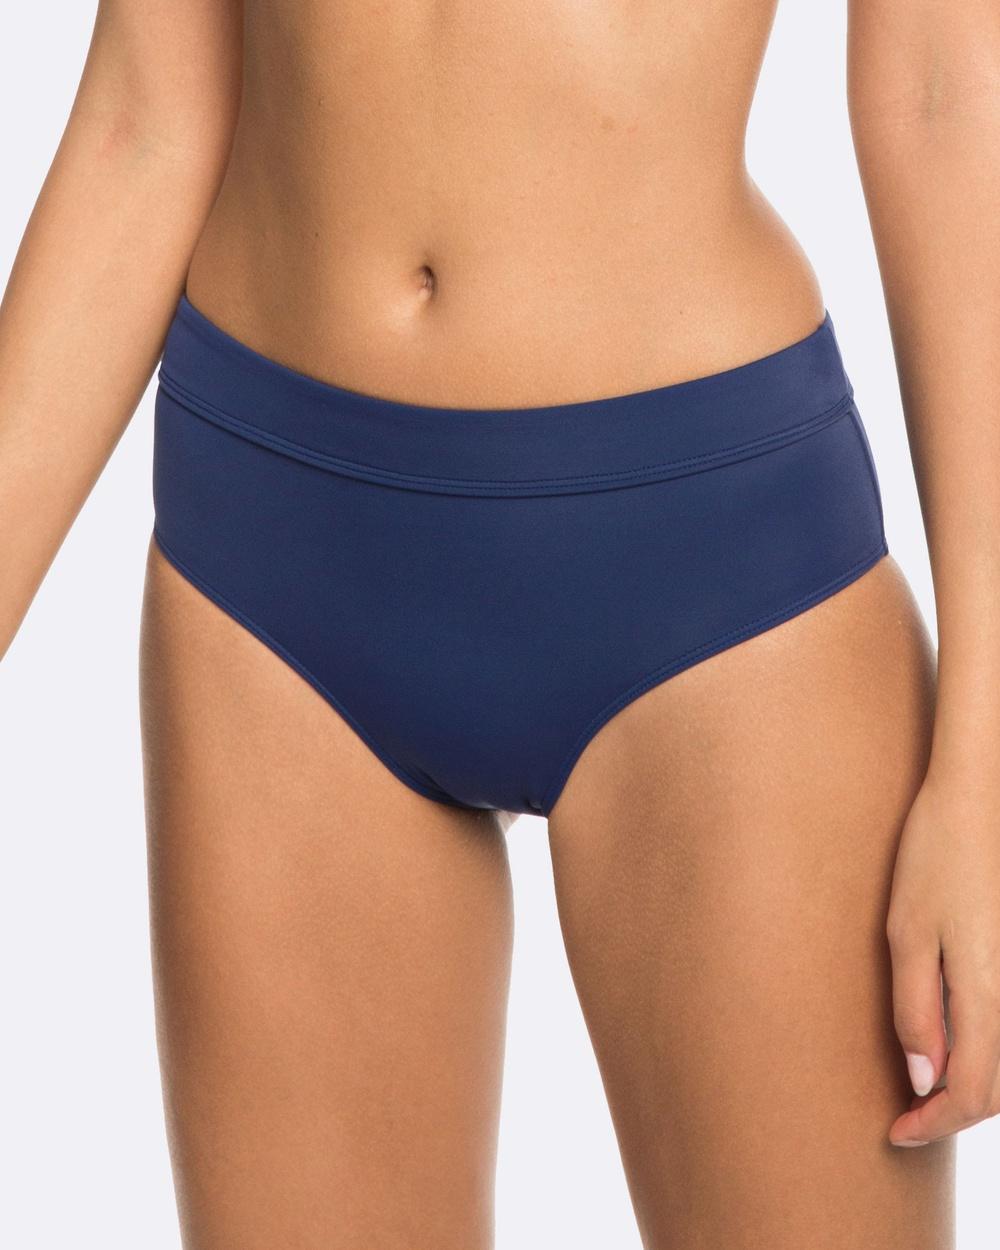 Roxy Womens Beach Basic Mid Waist Separate Bikini Pant Bikini Bottoms MEDIEVAL BLUE Womens Beach Basic Mid Waist Separate Bikini Pant